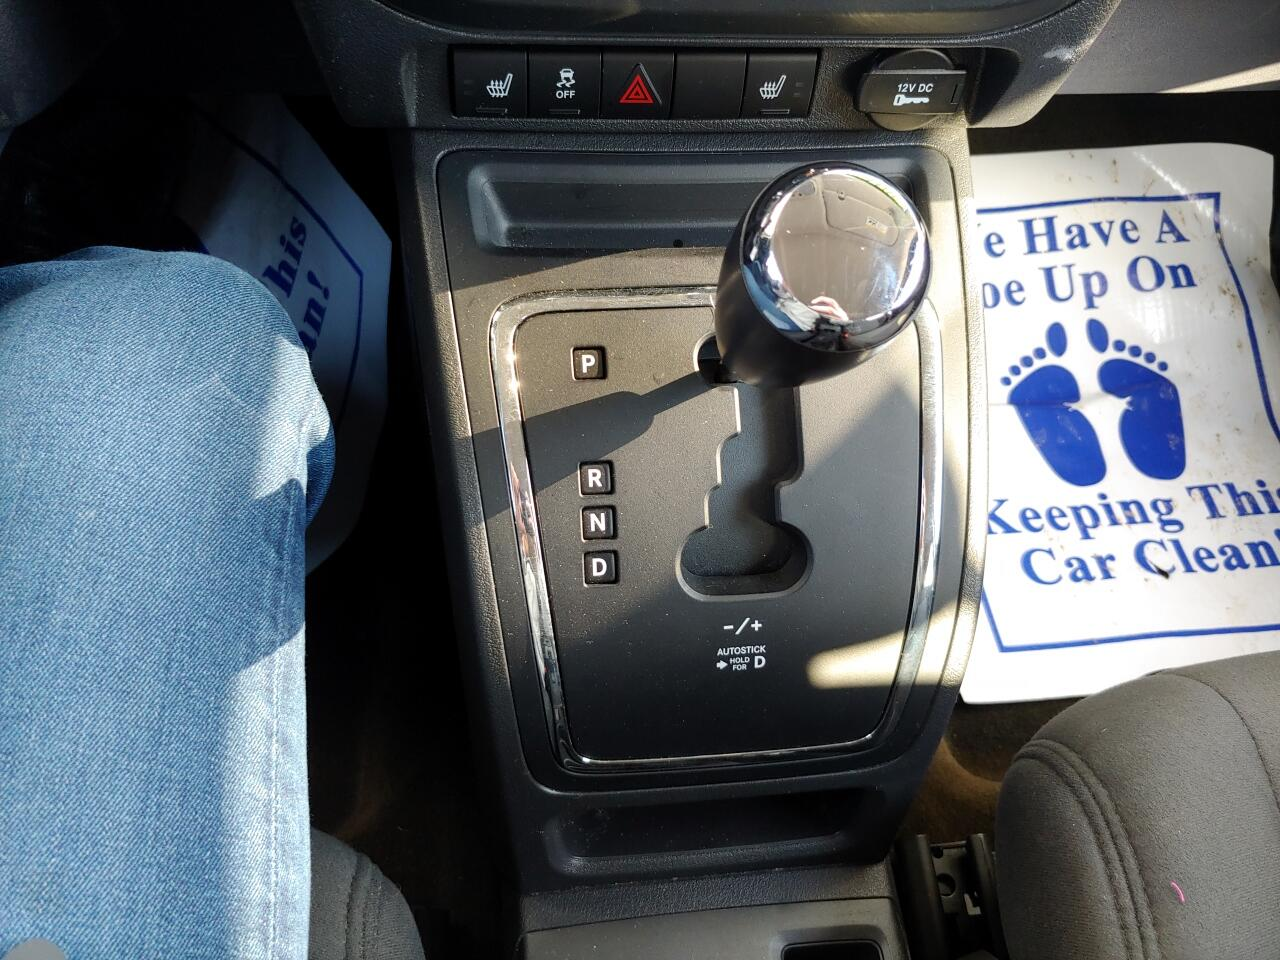 2016 Jeep Patriot FWD 4dr Latitude